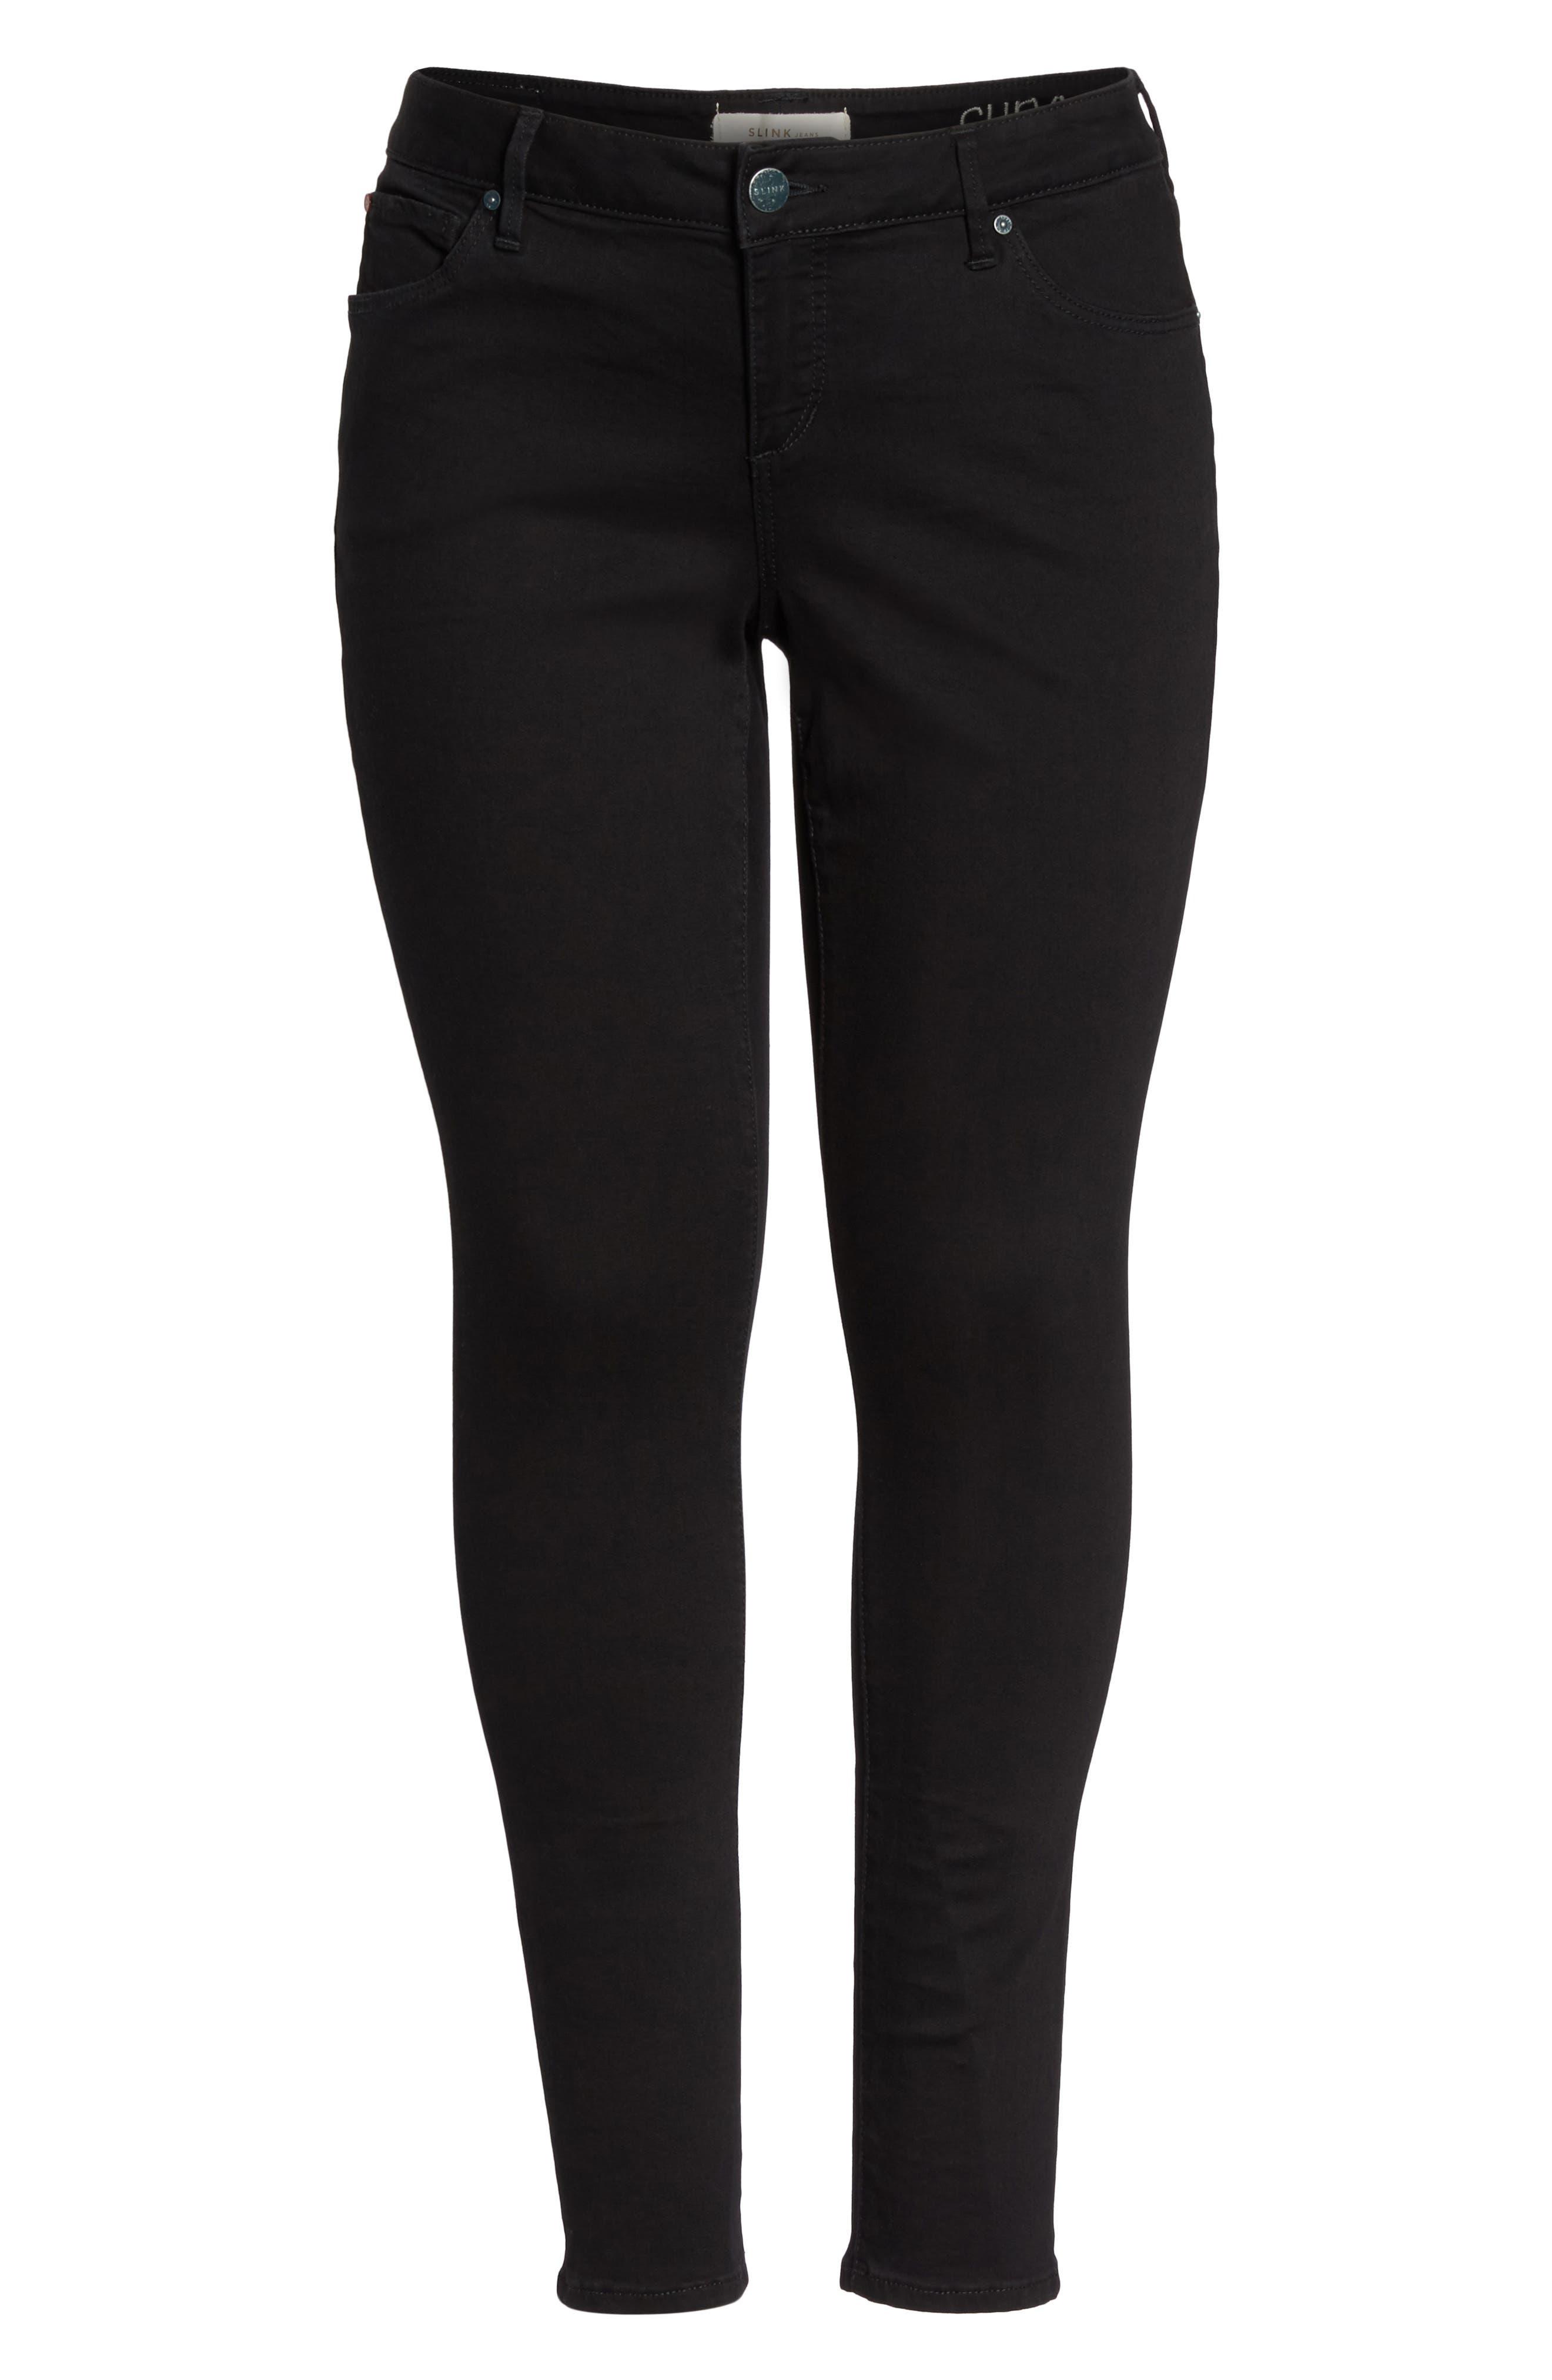 Alternate Image 3  - SLINK Jeans 'The Skinny' Stretch Denim Jeans (Danielle) (Plus Size)